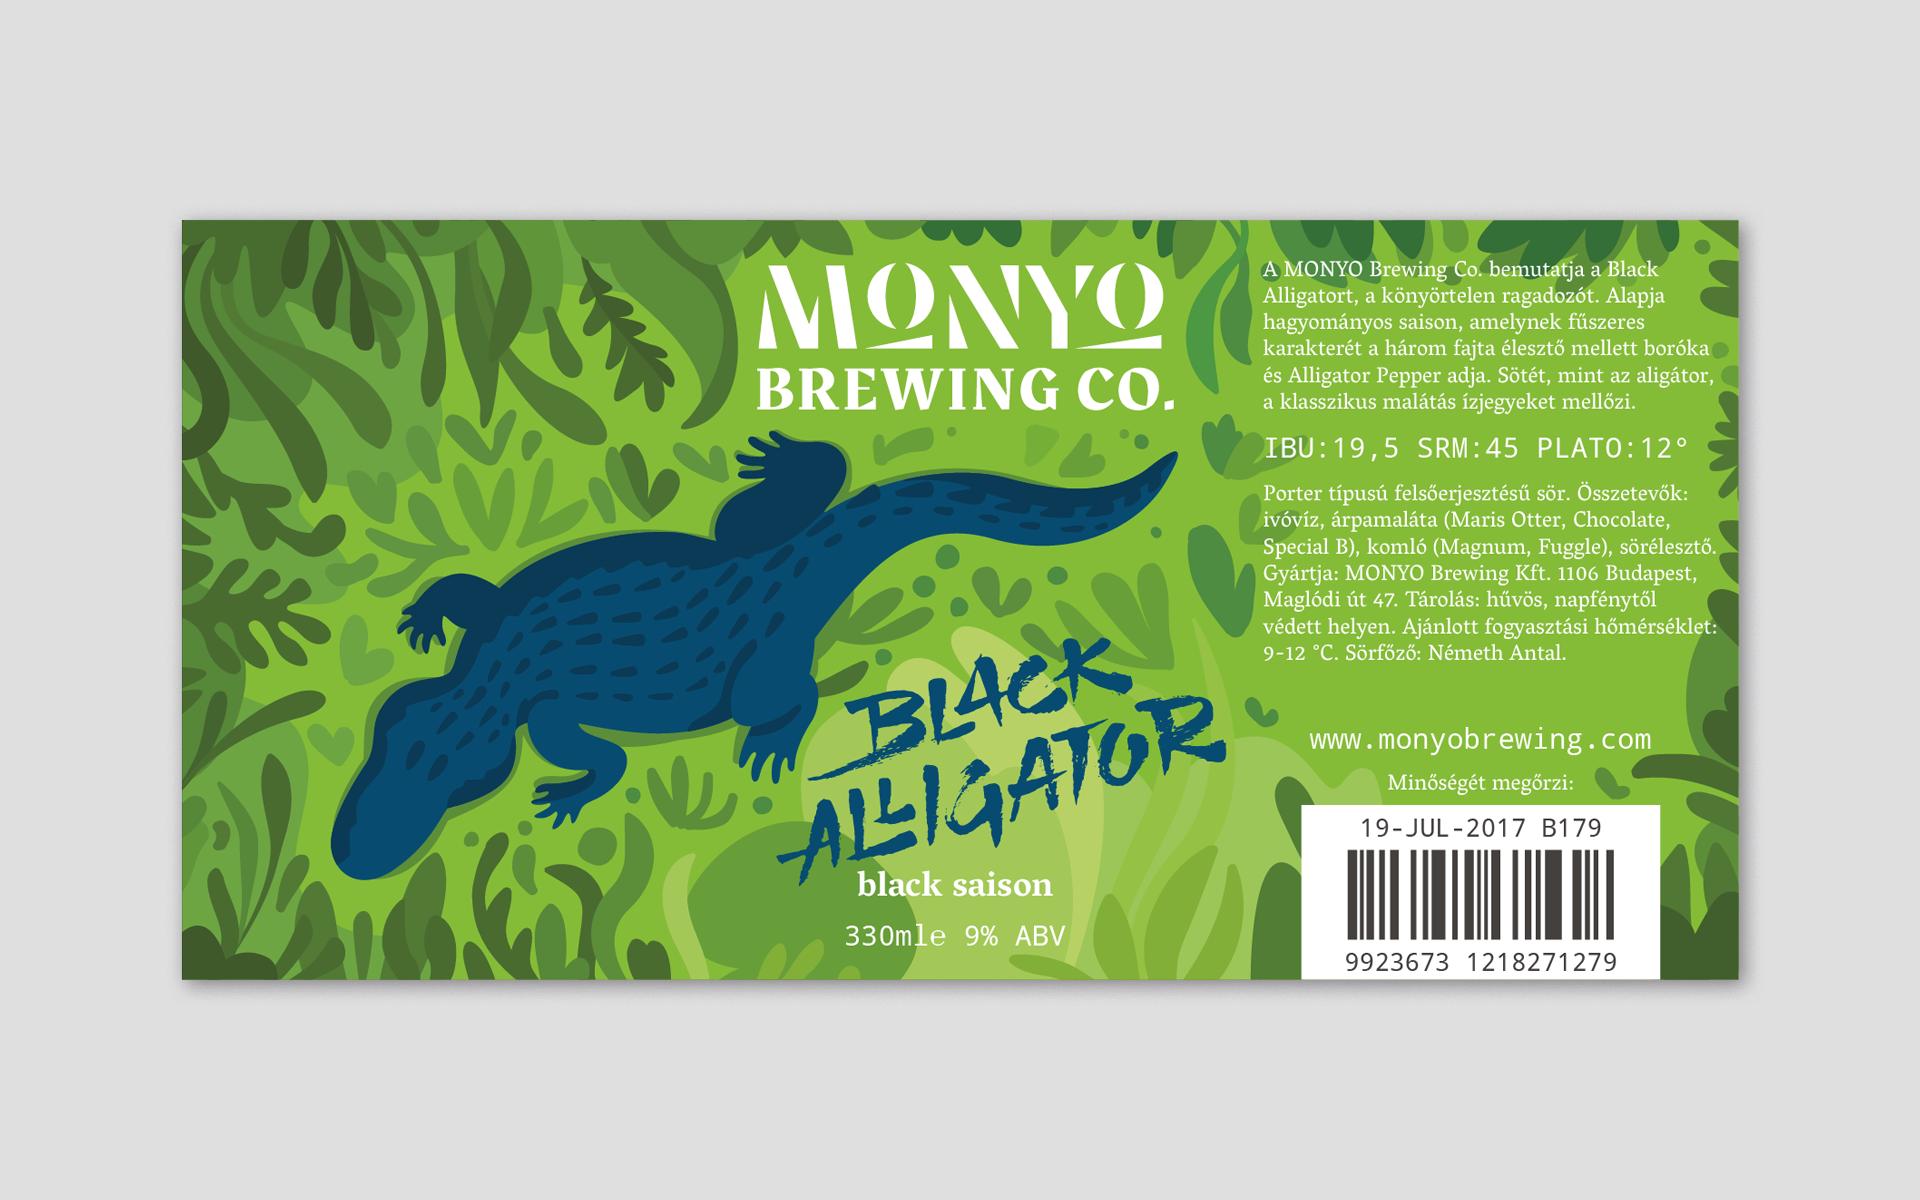 MONYO craft beer packaging \ Black Alligator label design